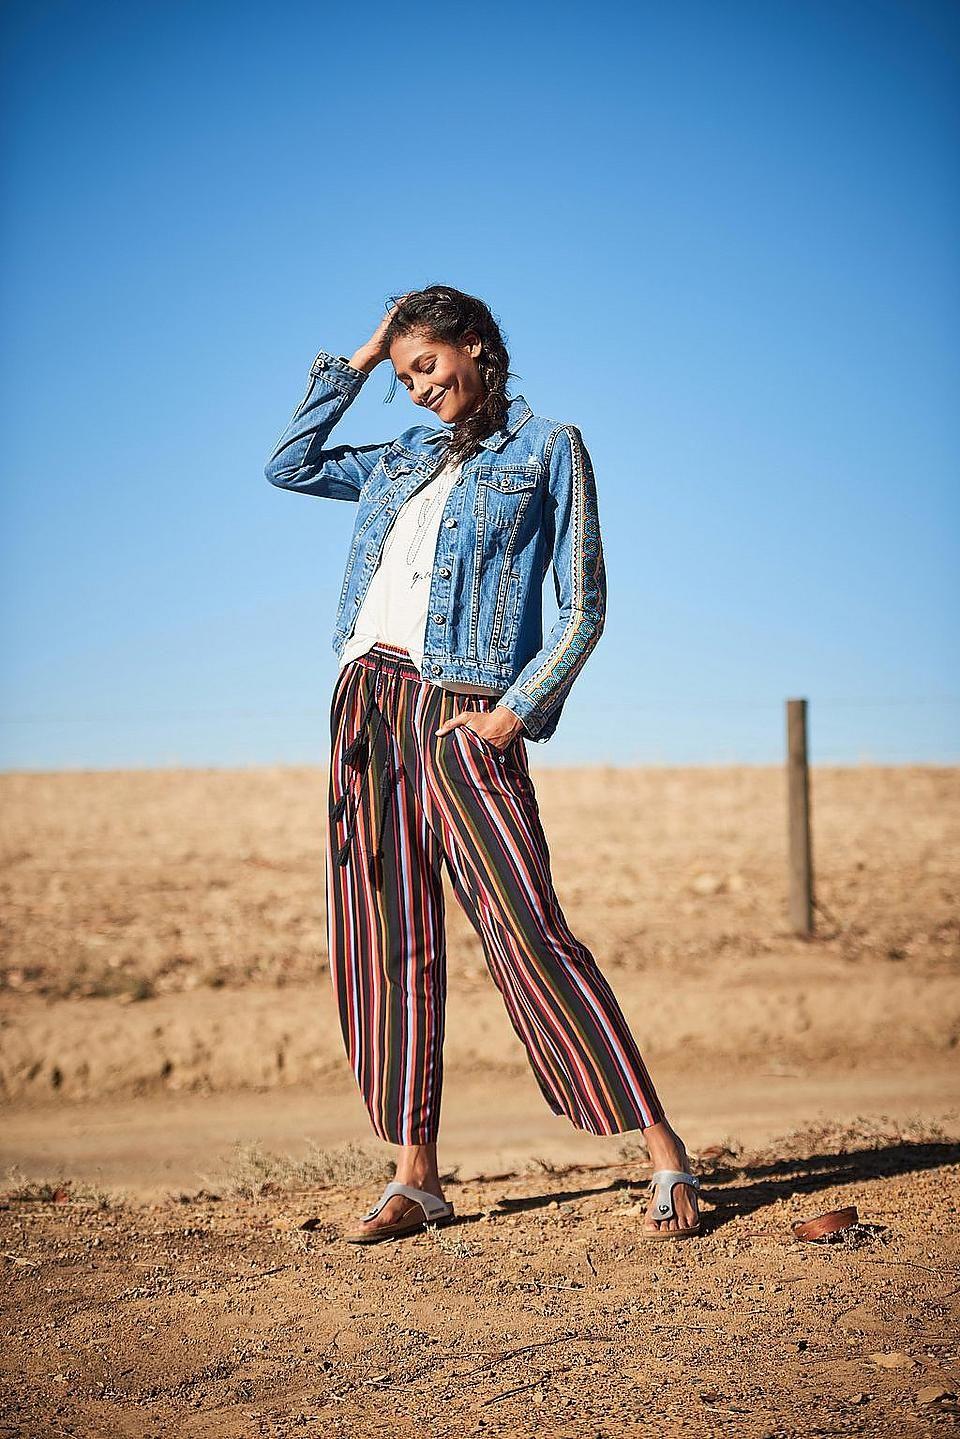 Tom Jacken Tailor JeansjackeW35 Bekleidung 2018 Denim NOk0w8ZXnP